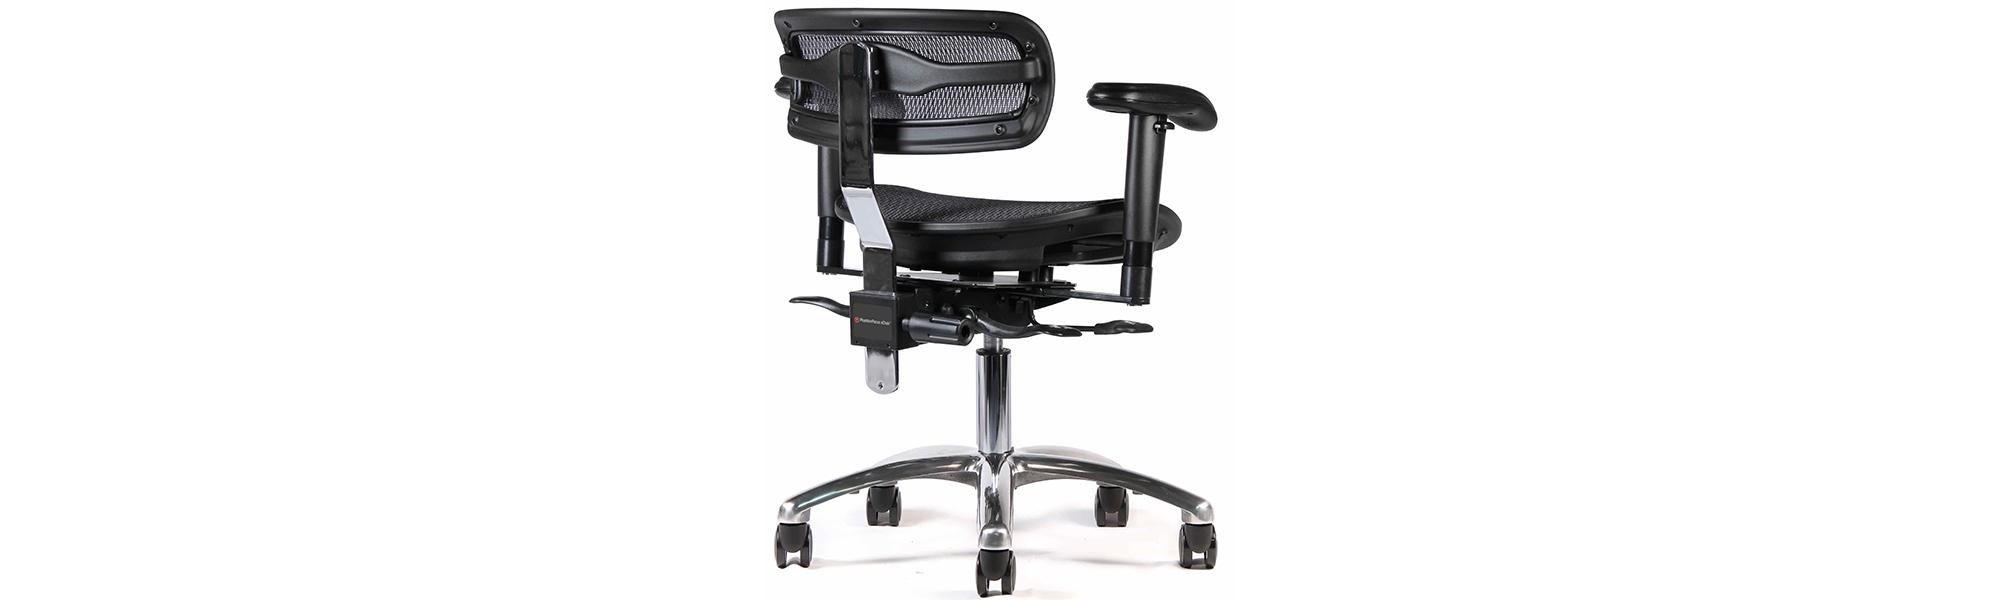 chairblack back